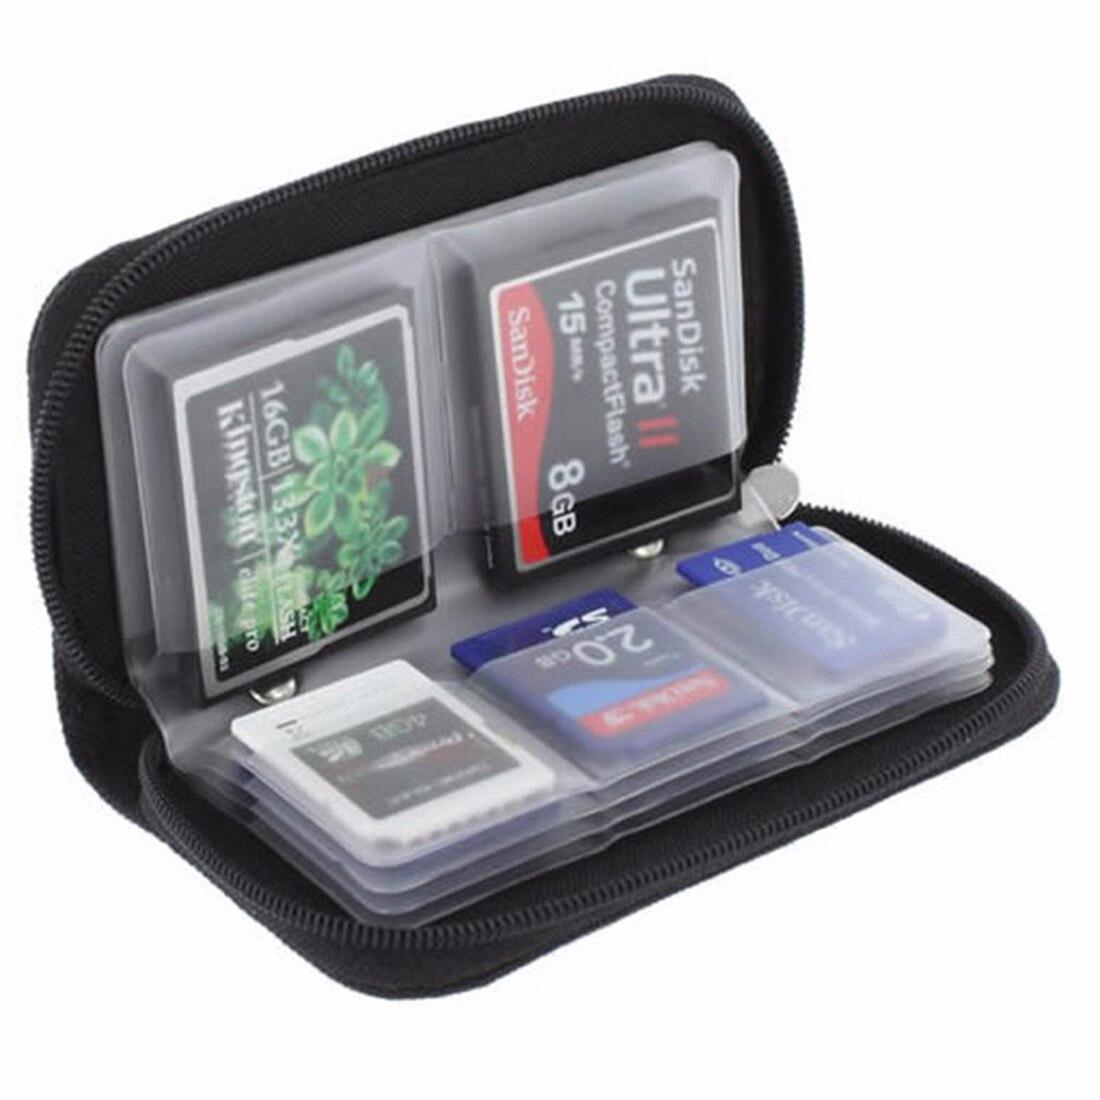 9 slots MI-EShop.Waterproof /& Shockproof Memory Card Case Storage Box for 3 SD /& 2 CF /& 2 TF /& 2 XQD Memory Card Case Carrying Holder 9 Slots